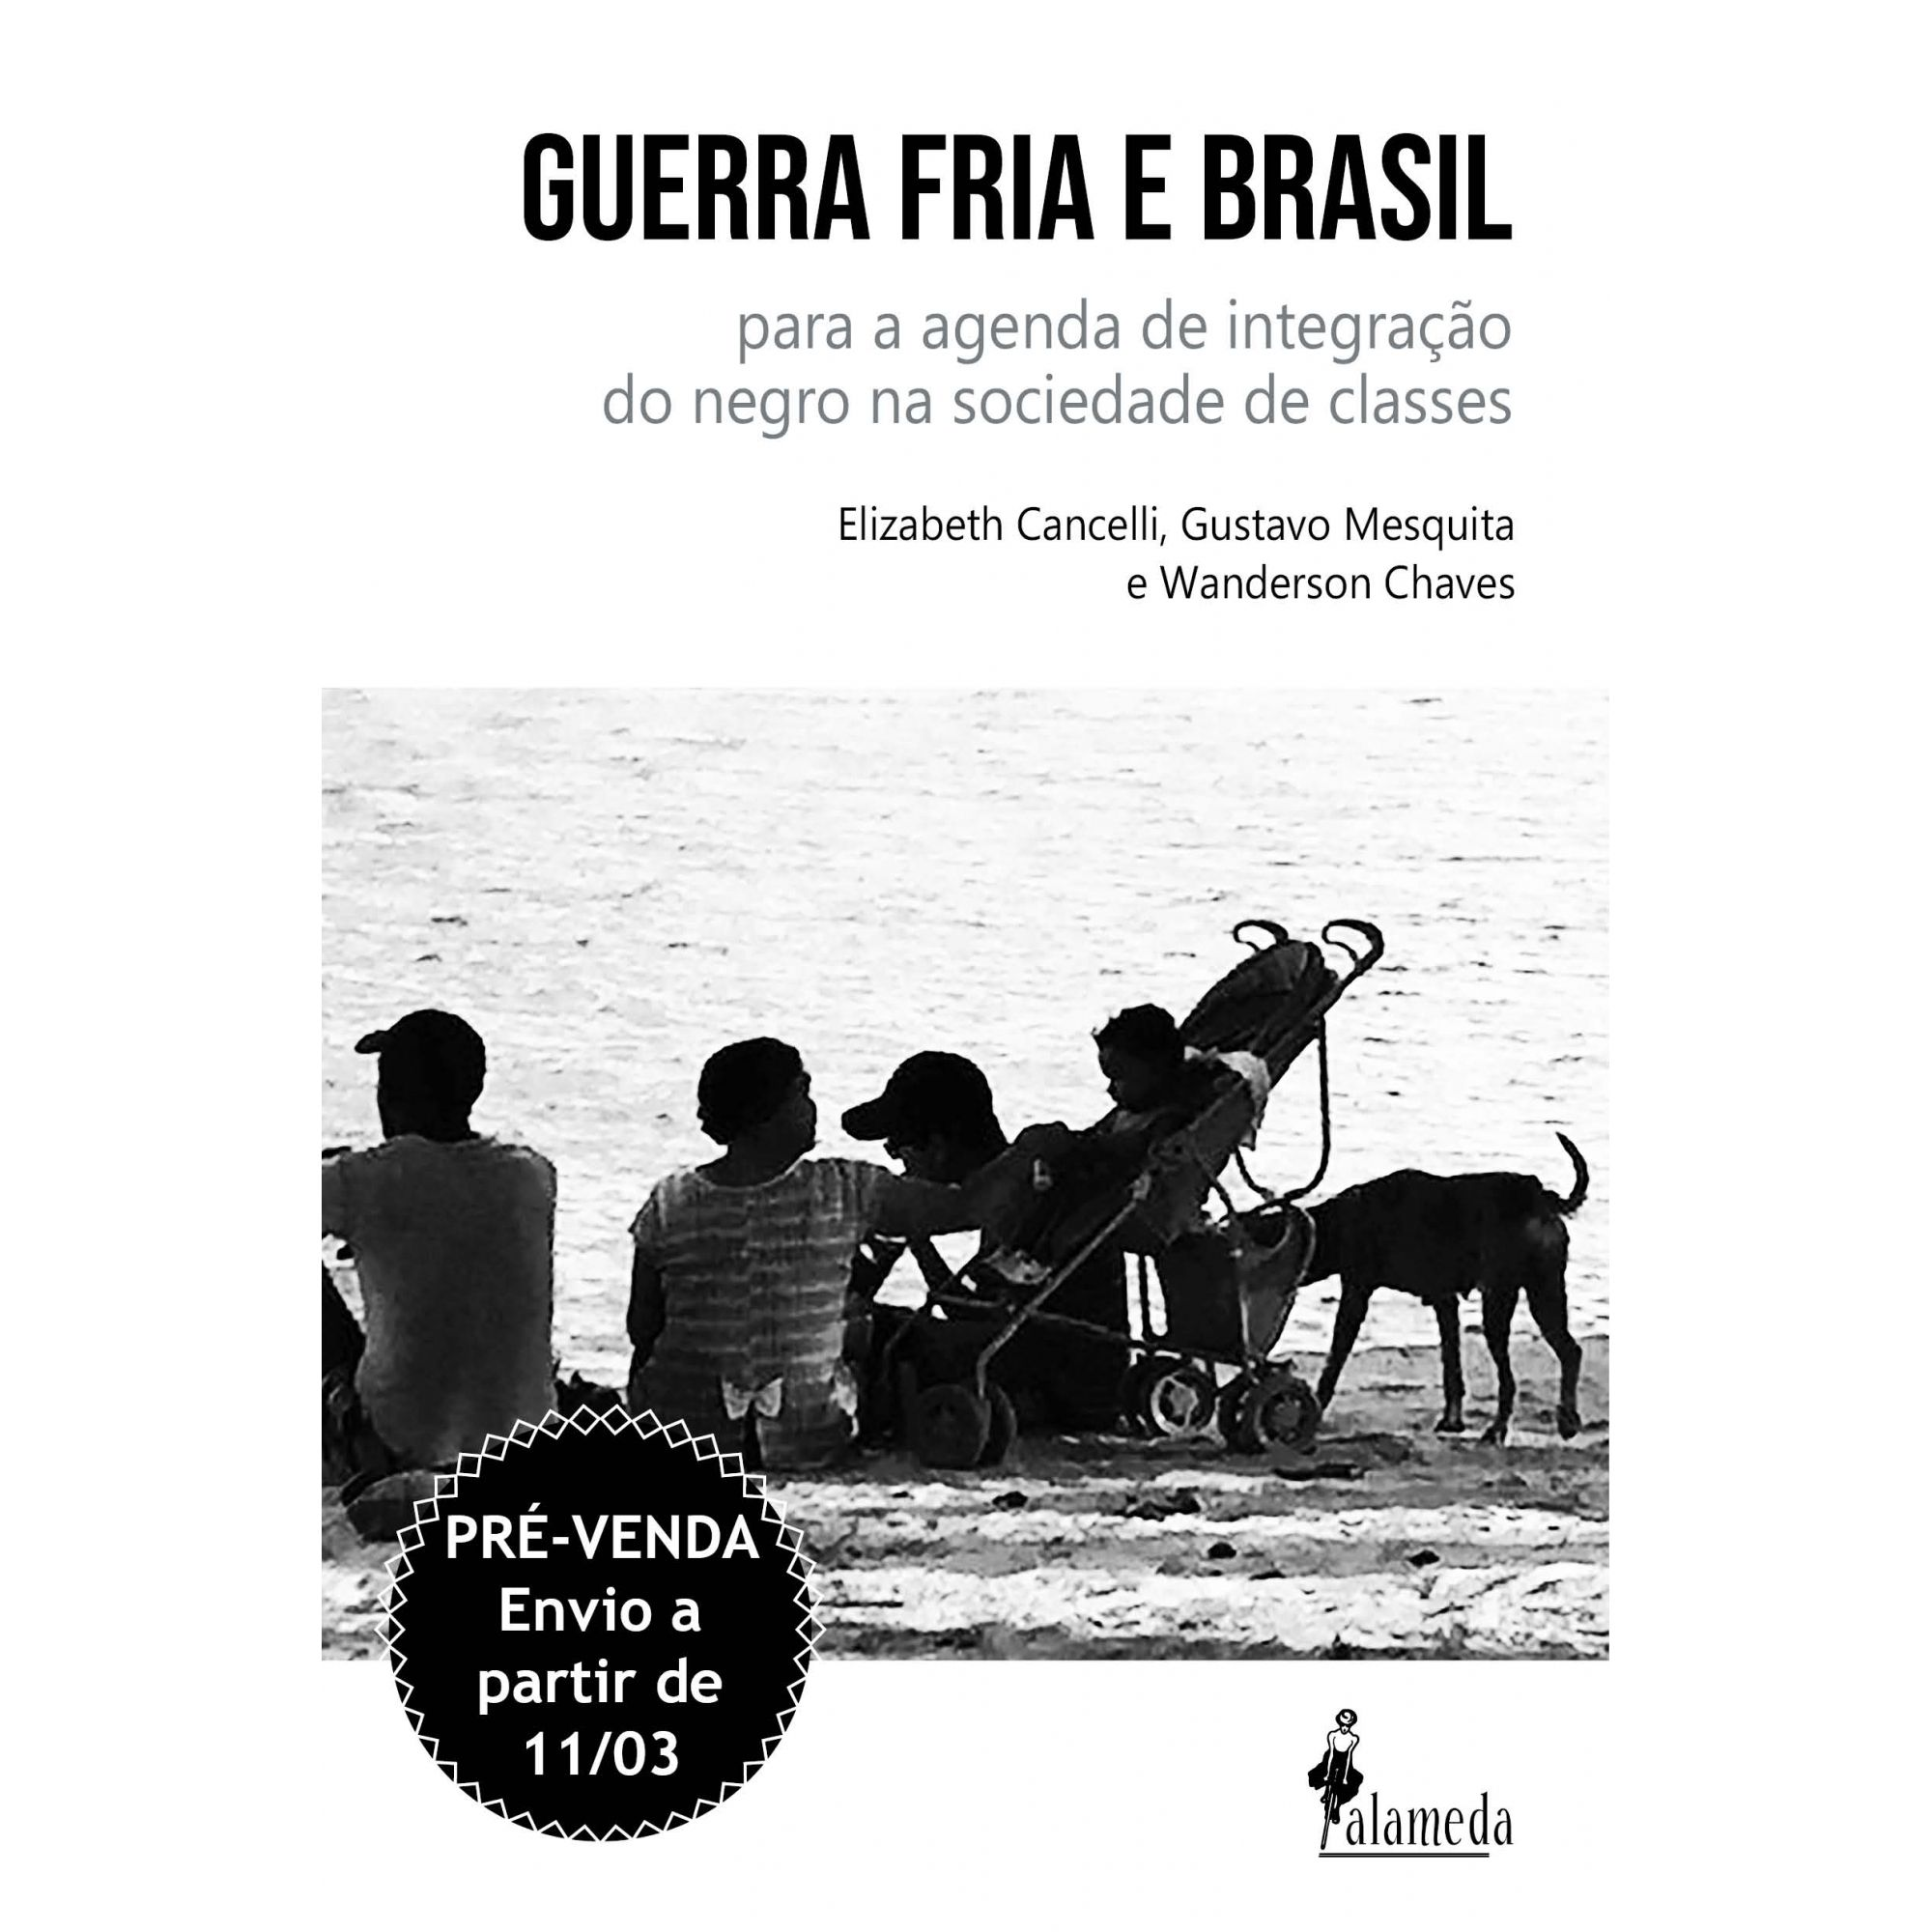 PRÉ-VENDA: Guerra Fria e Brasil, de Elizabeth Cancelli, Gustavo Mesquita e Wanderson Chaves (ENVIO A PARTIR DE 11/03/20)